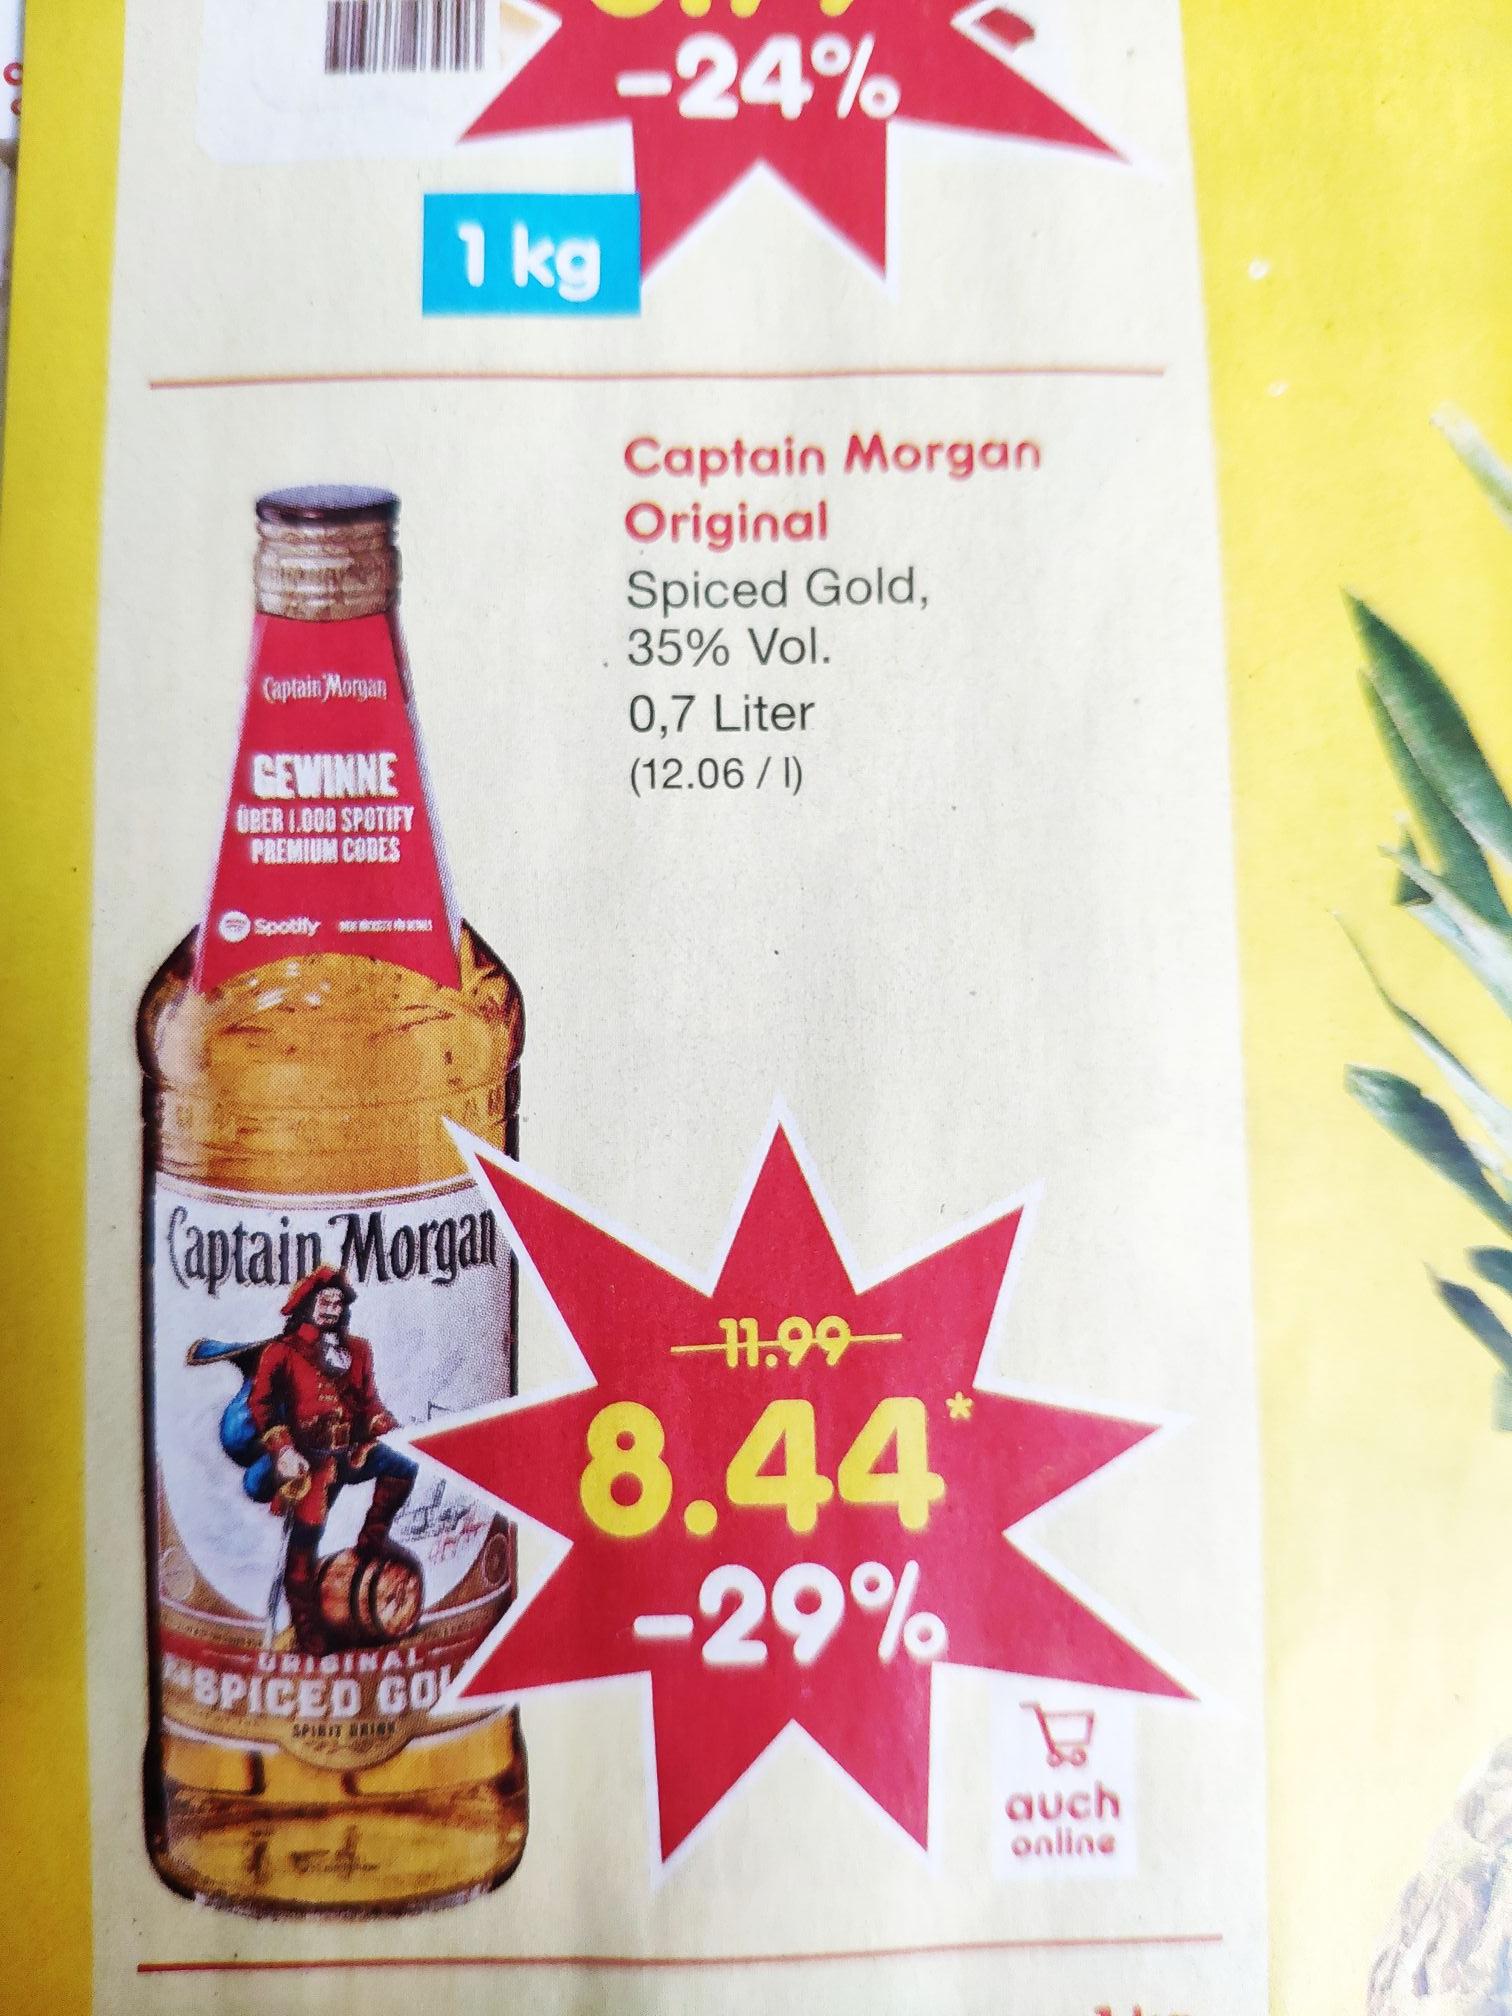 (Netto MD) Captain Morgan Spiced Gold 0,7l am 15.06